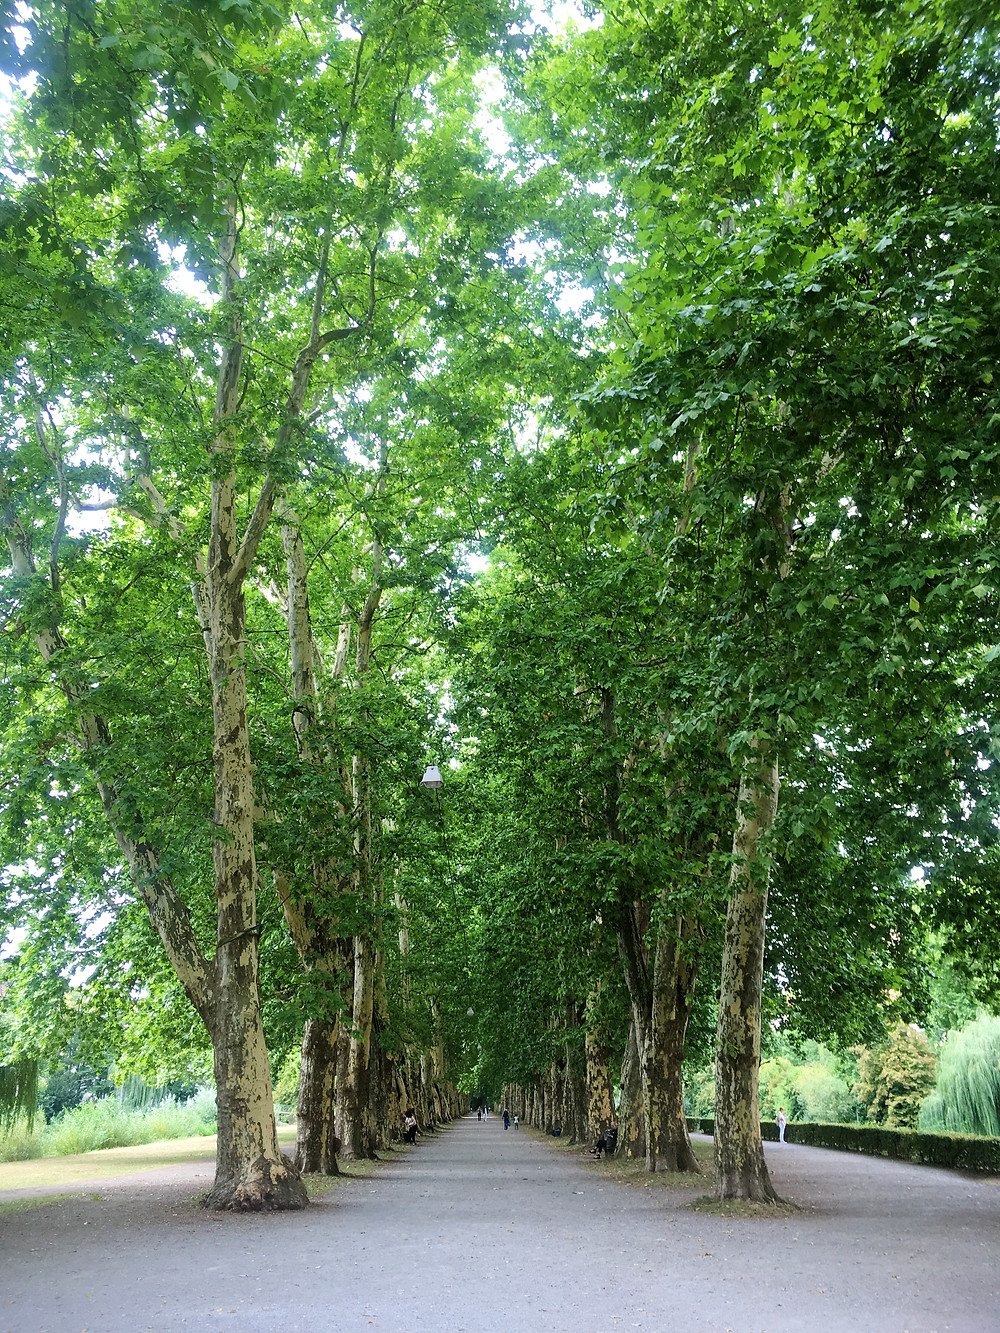 Plantanenallee tree cathedral walkway